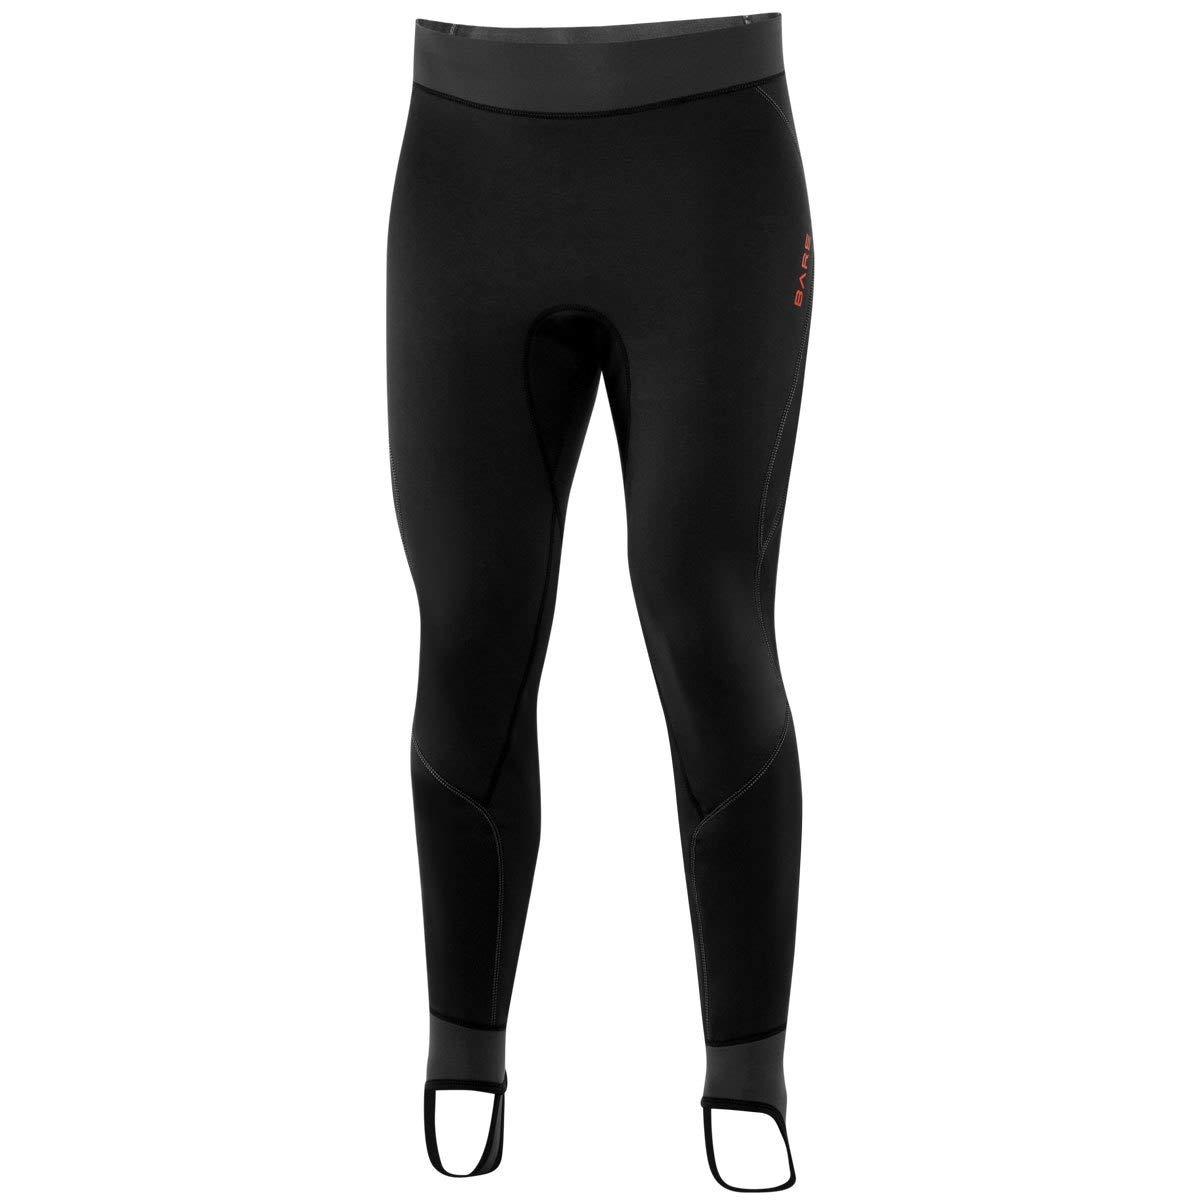 Bare Mens Exowear Pants Wet/Dry Undergarment (Medium Large)